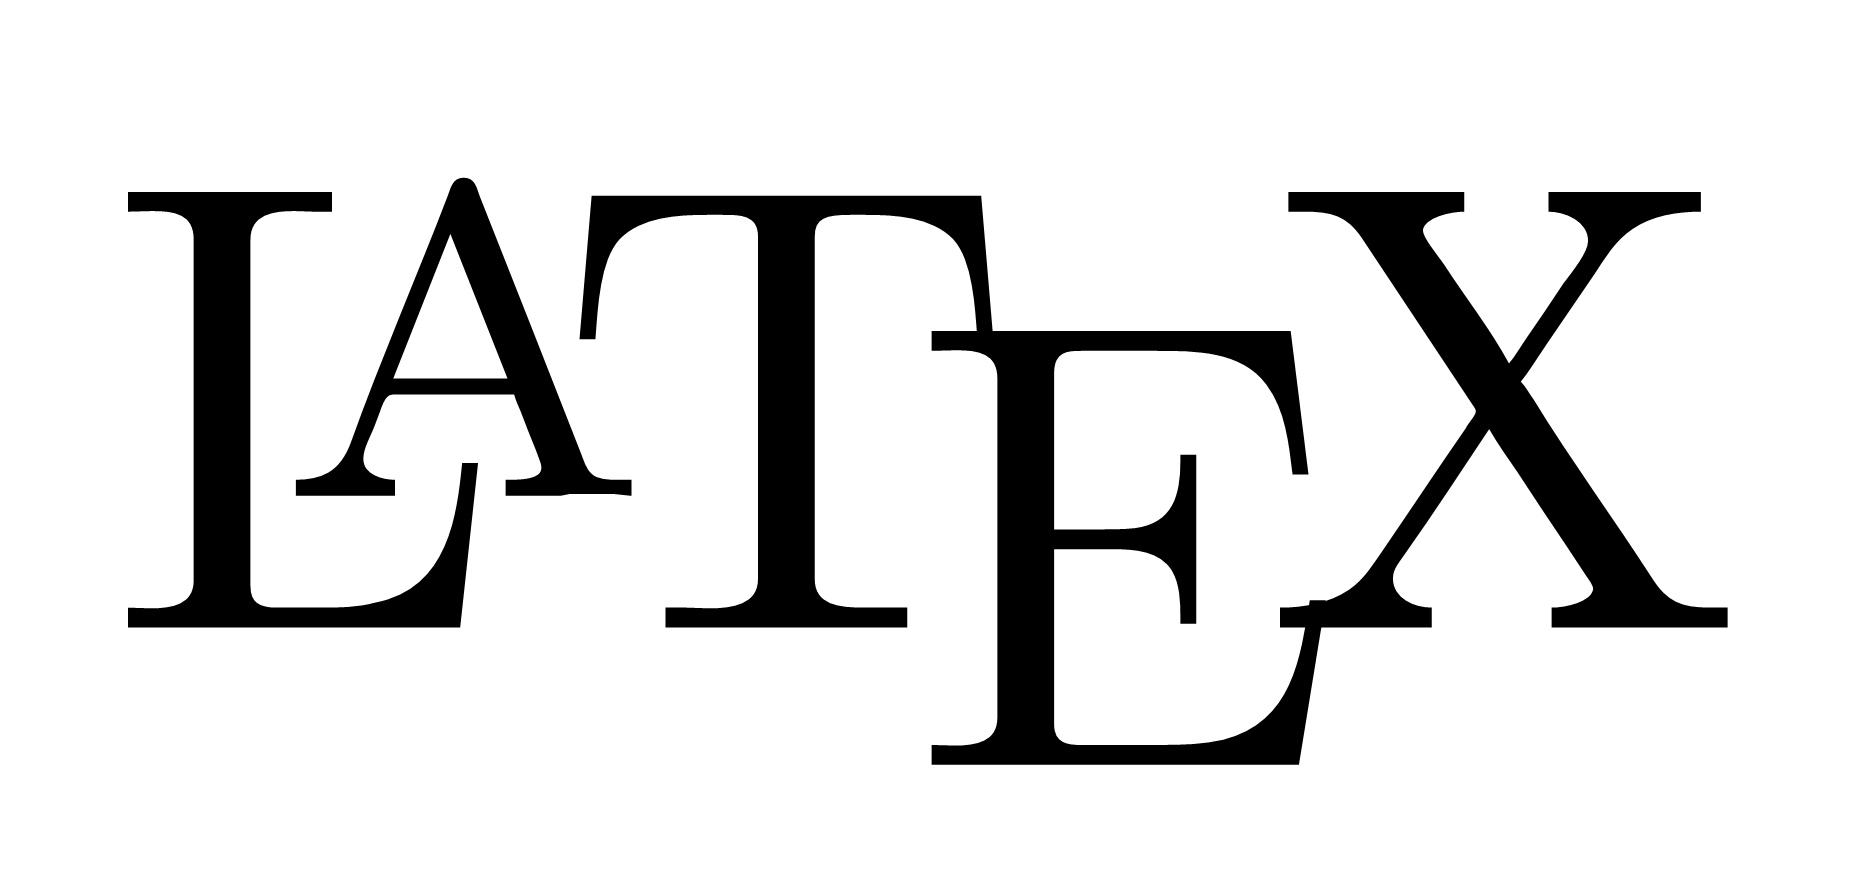 Resistor Symbol In Ms Word